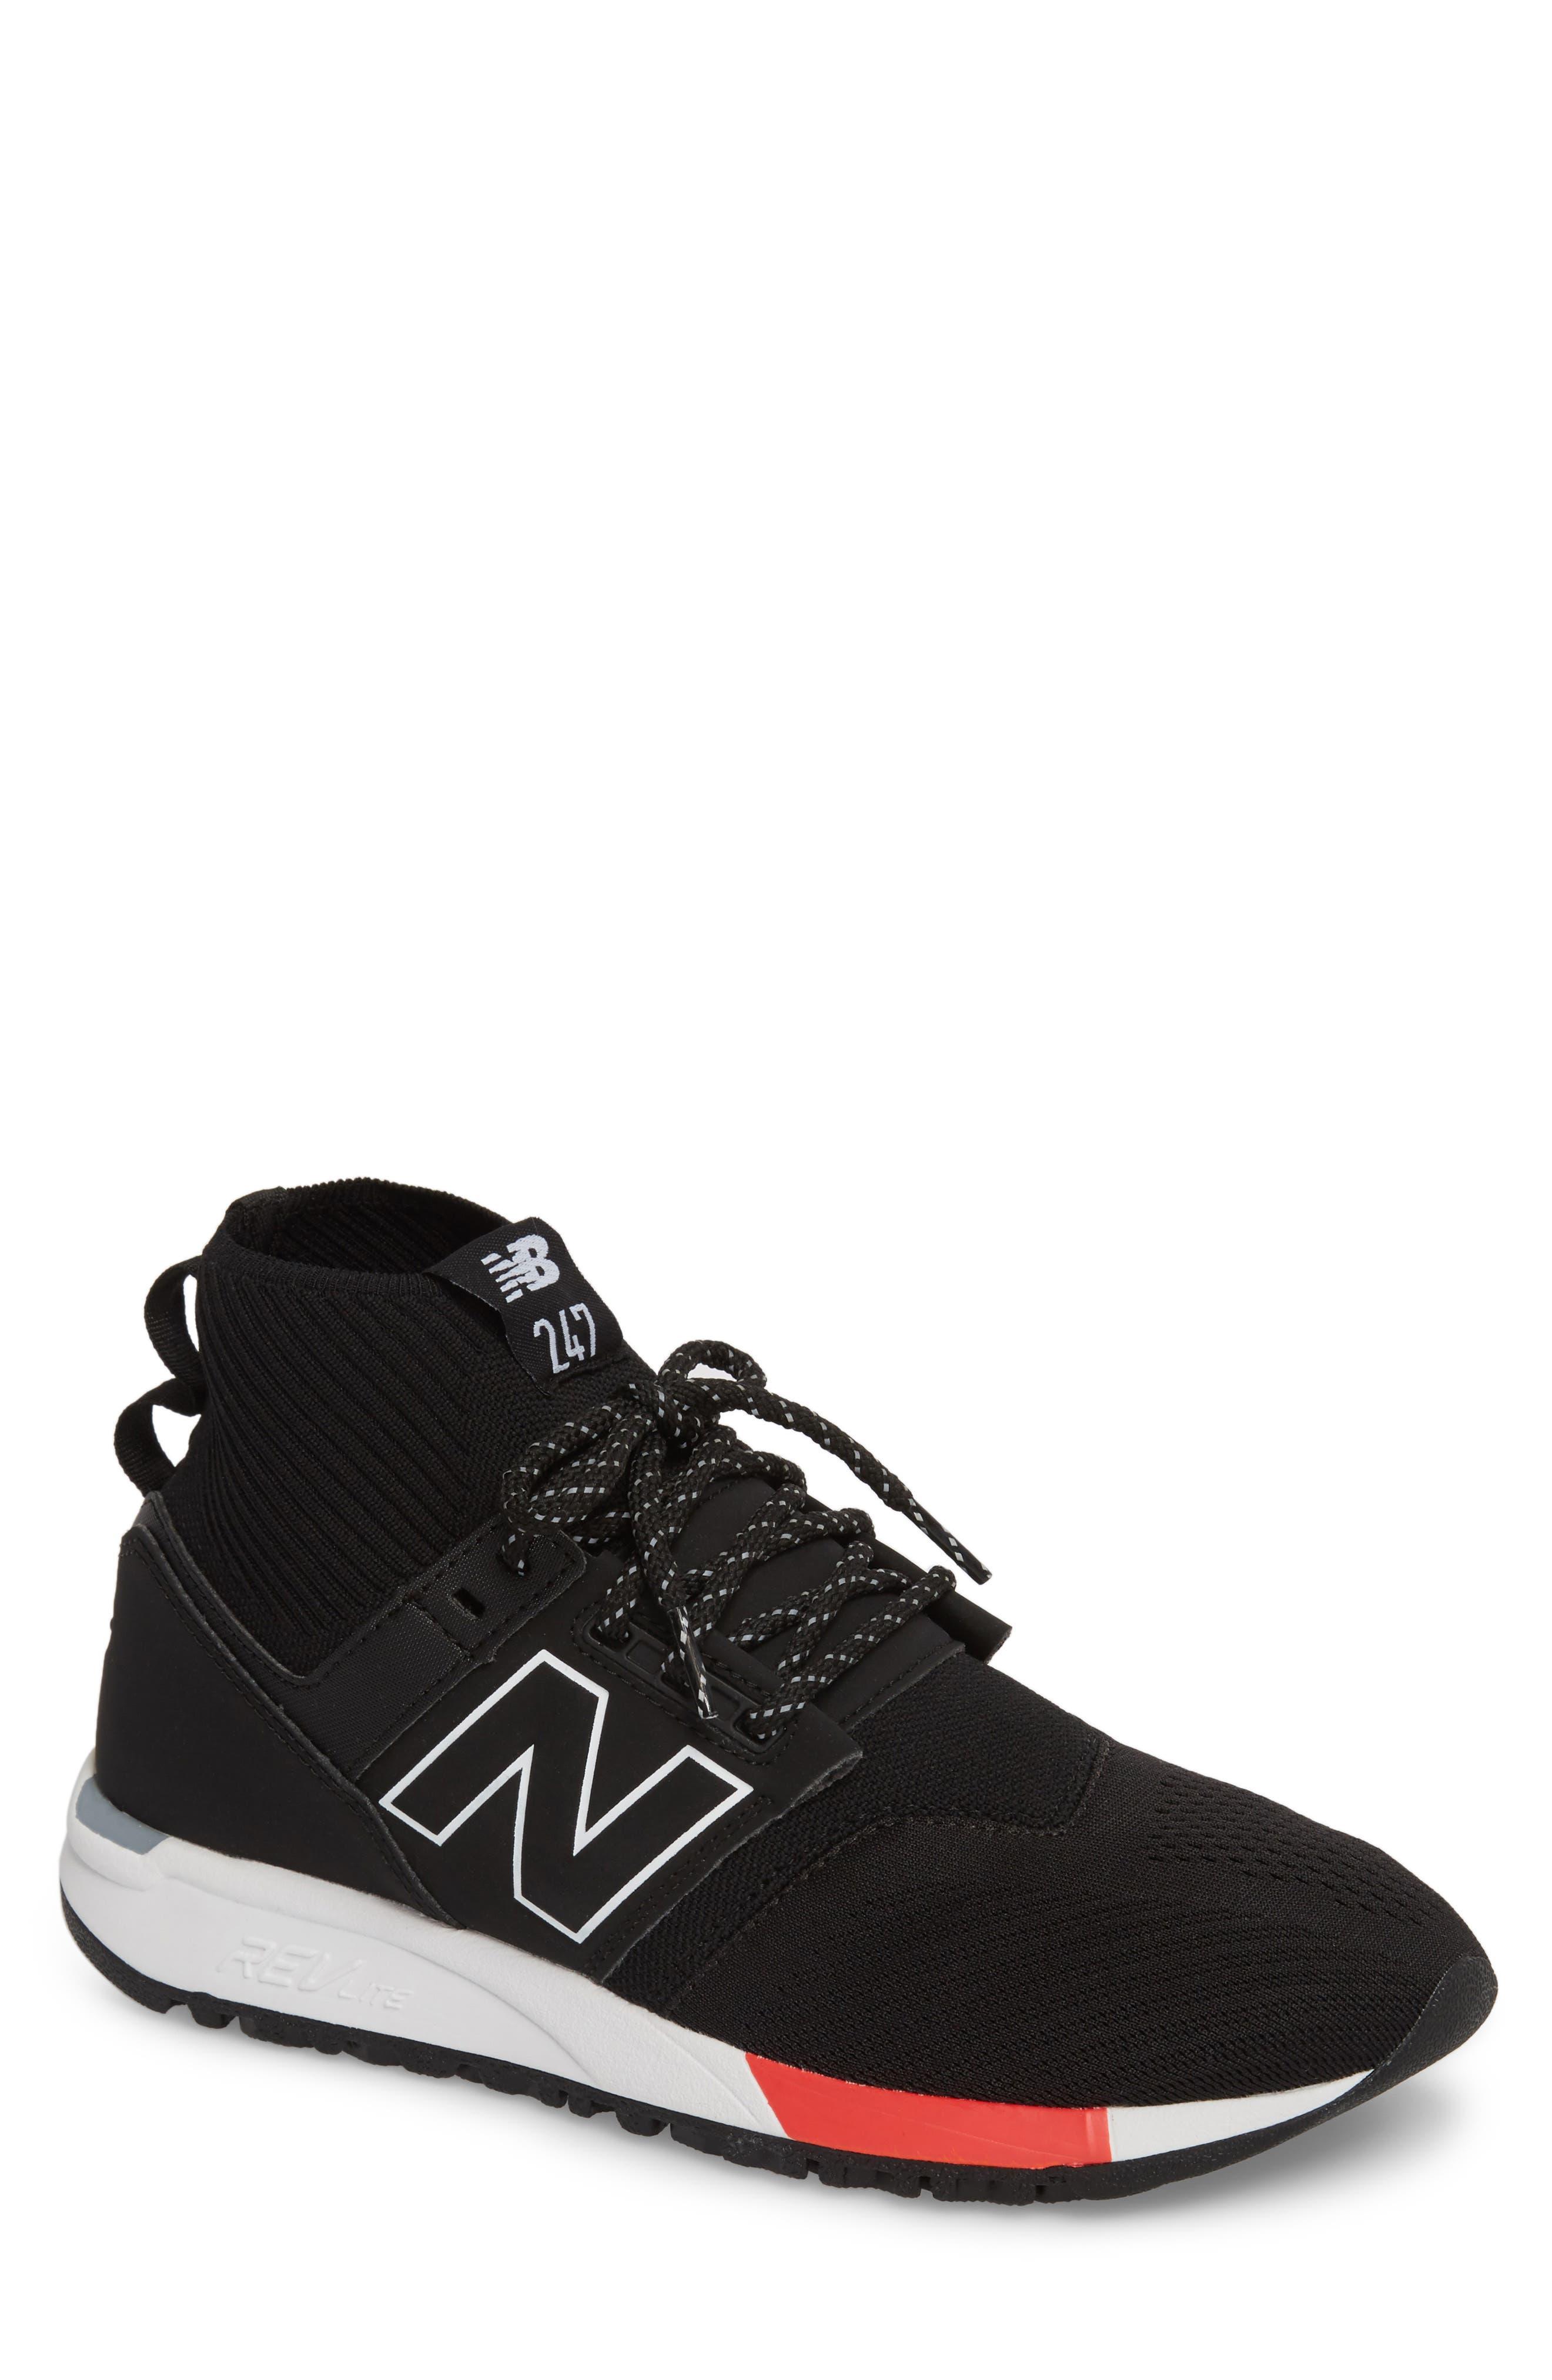 247 Mid Sneaker,                             Main thumbnail 1, color,                             Black